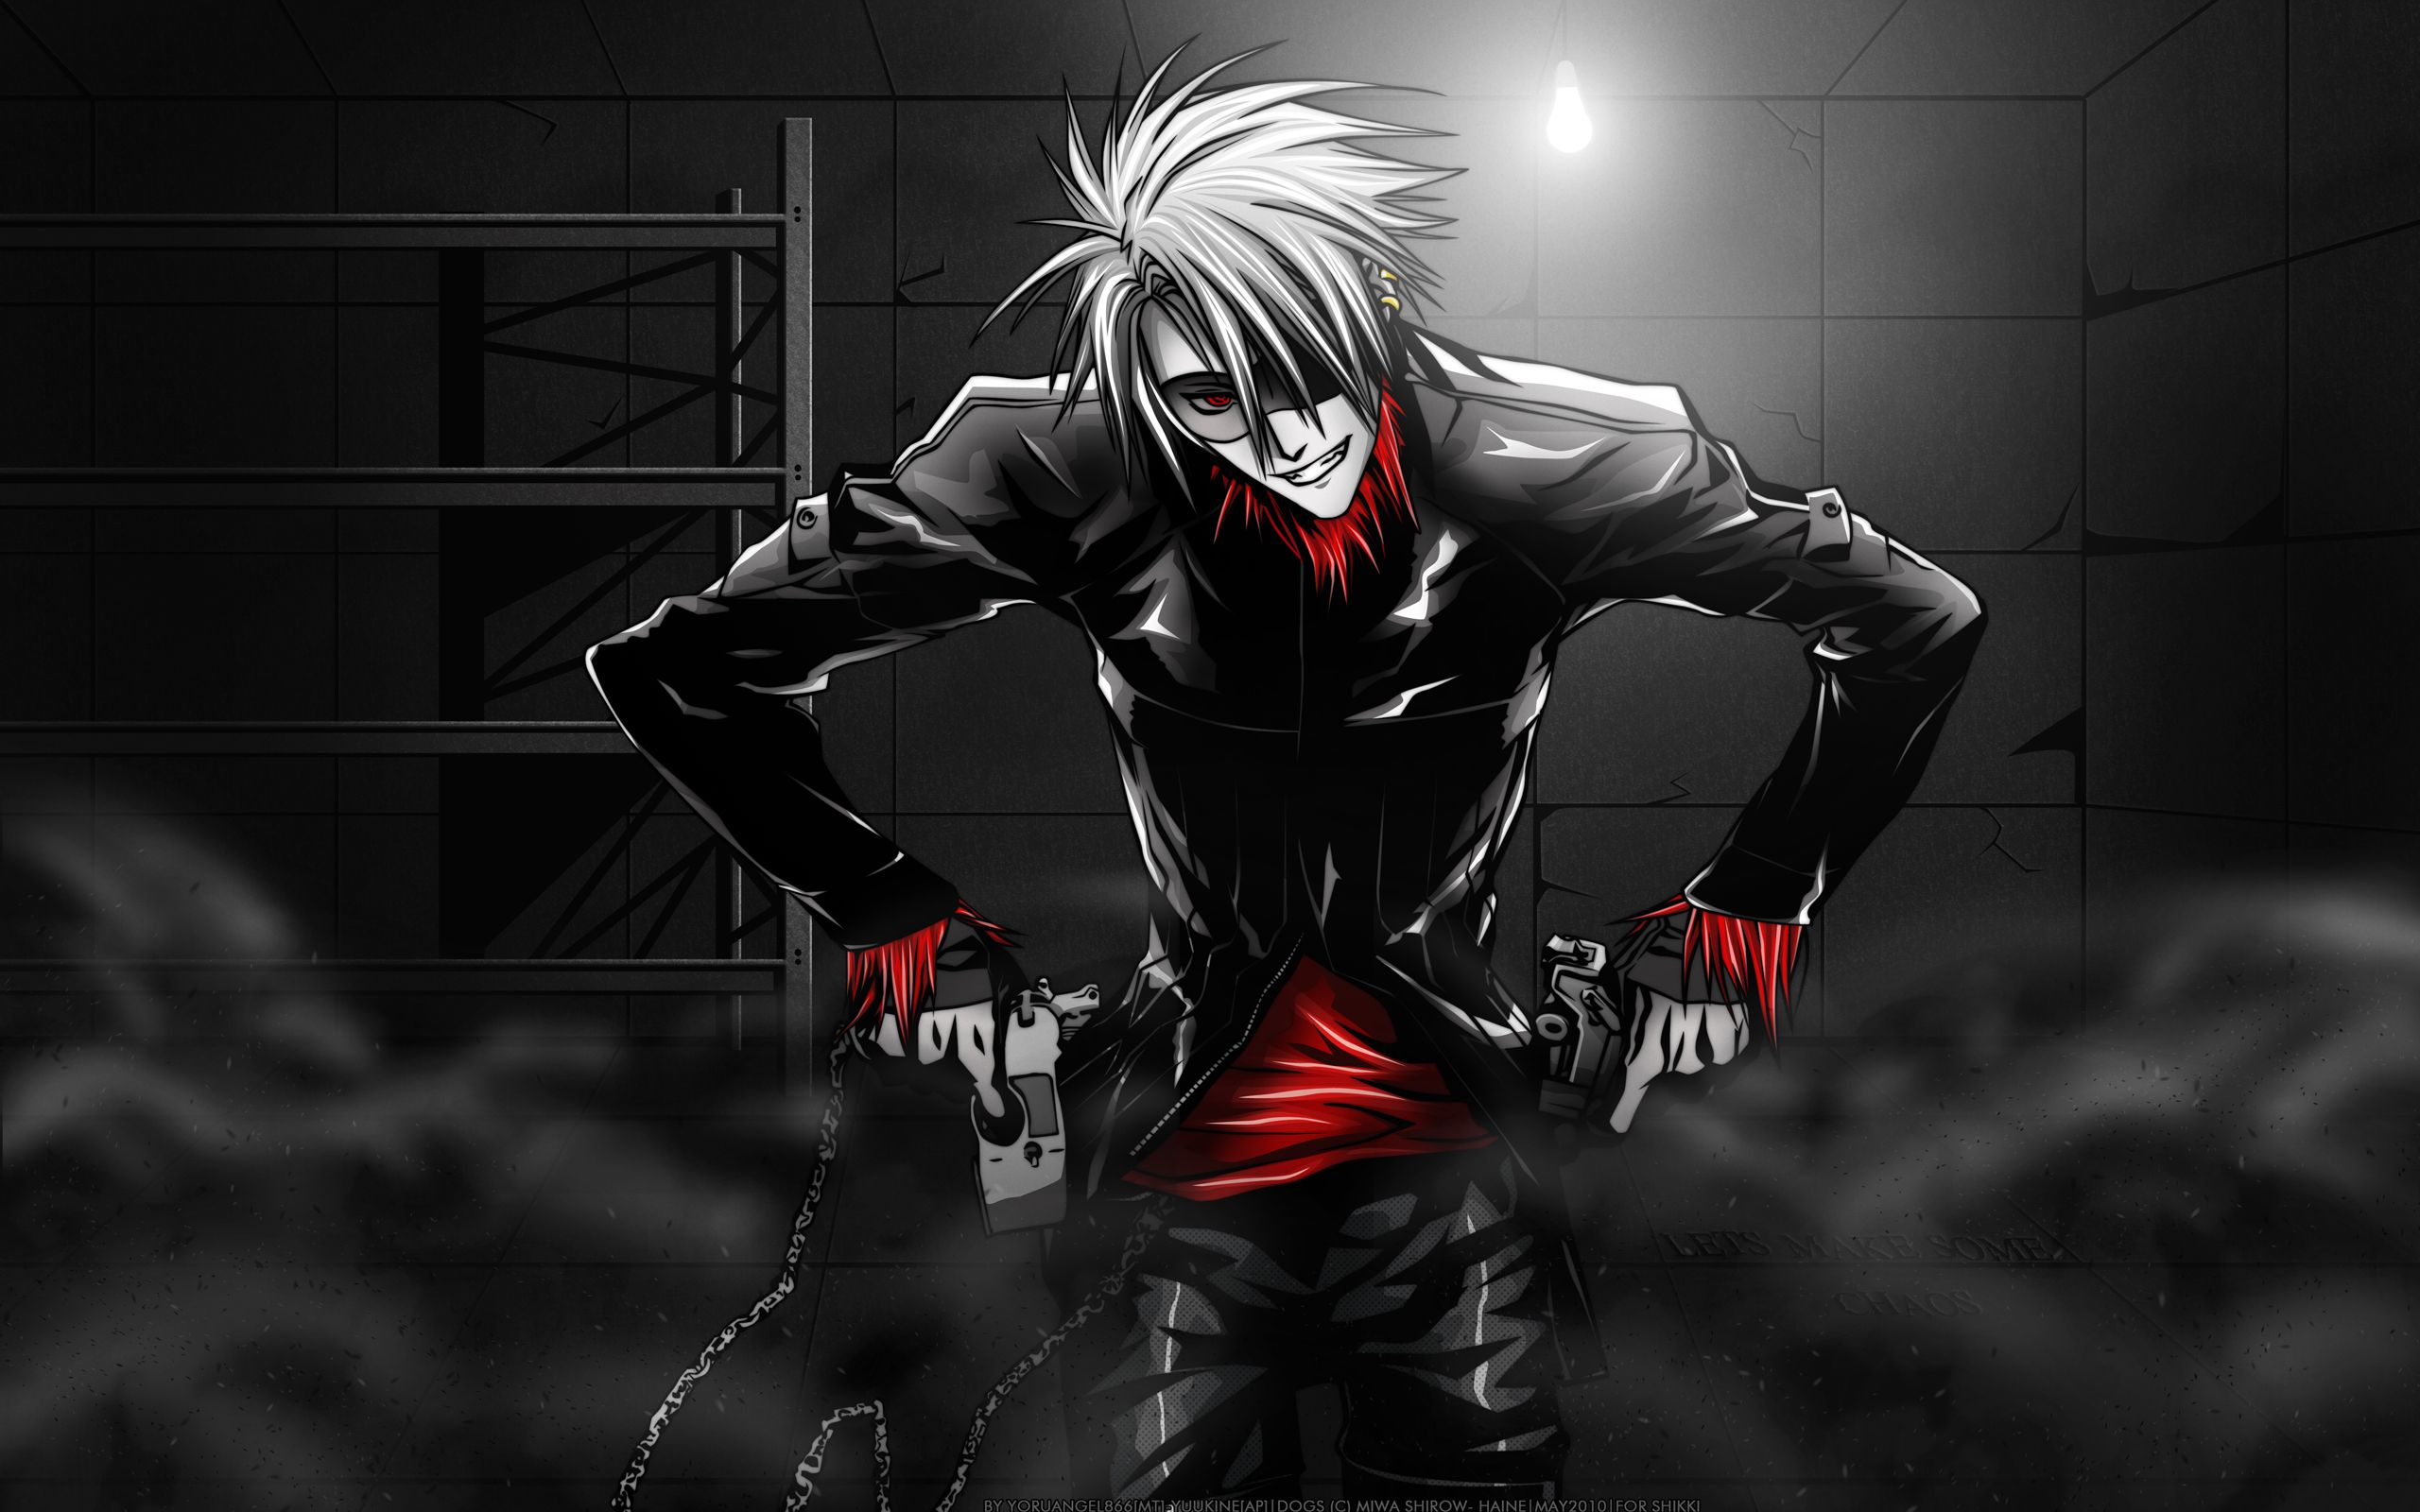 Sexy Anime Male Demons | anime demon boy wallpaper anime demon boy with wings anime demons ...